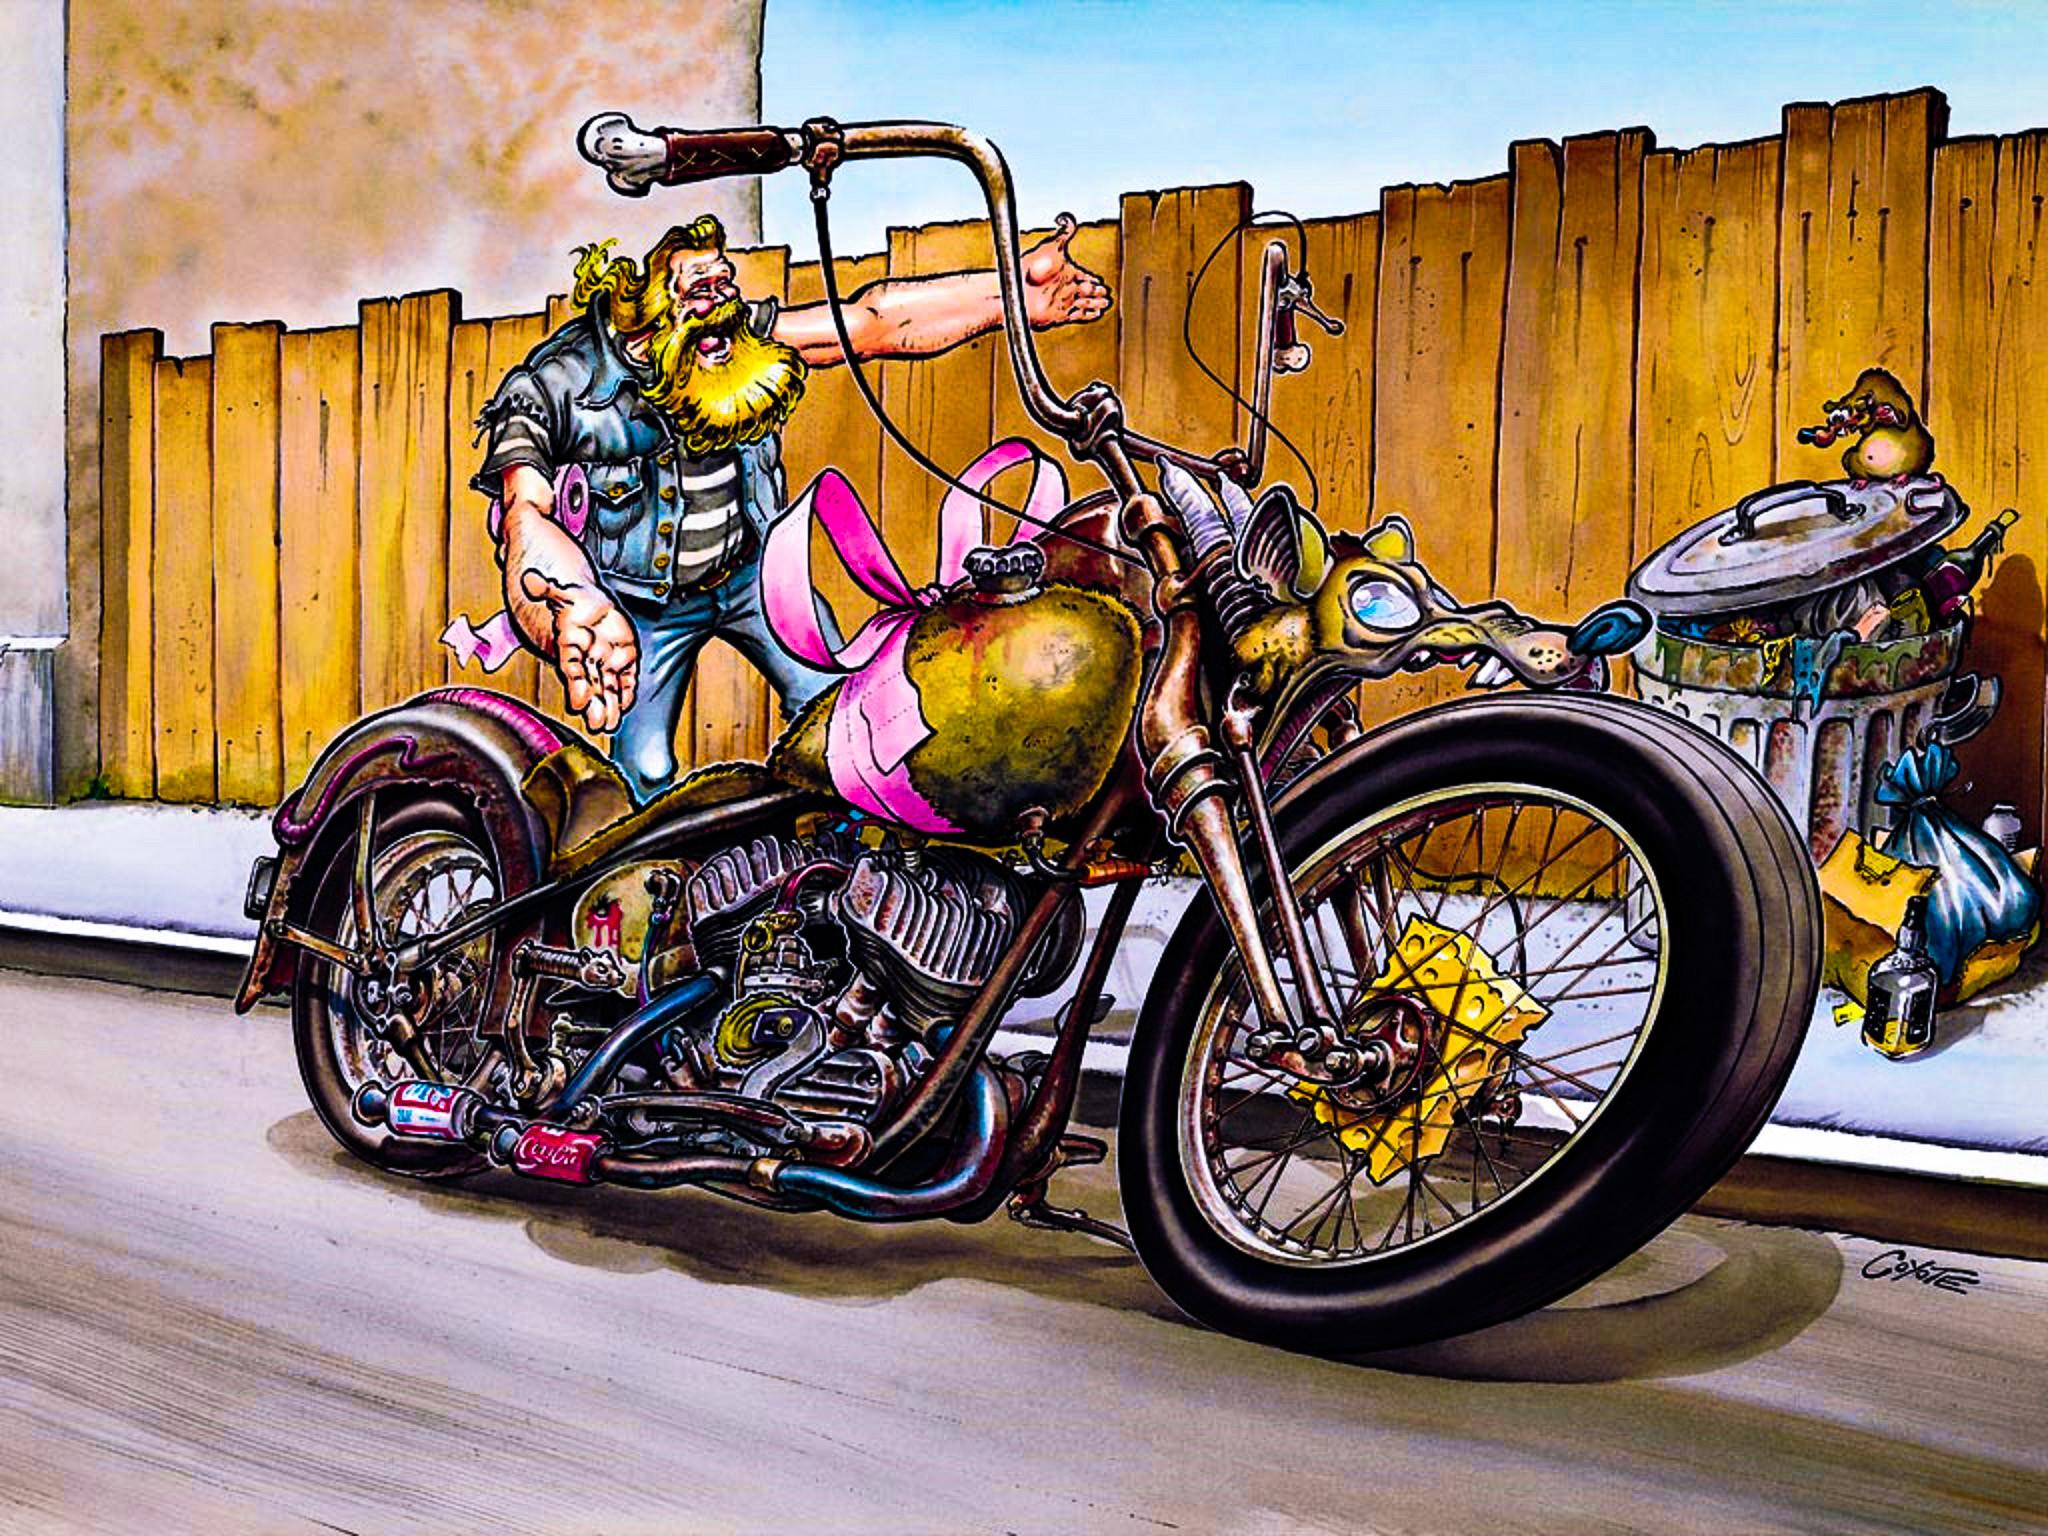 biker mann david coyote collection orientated bd